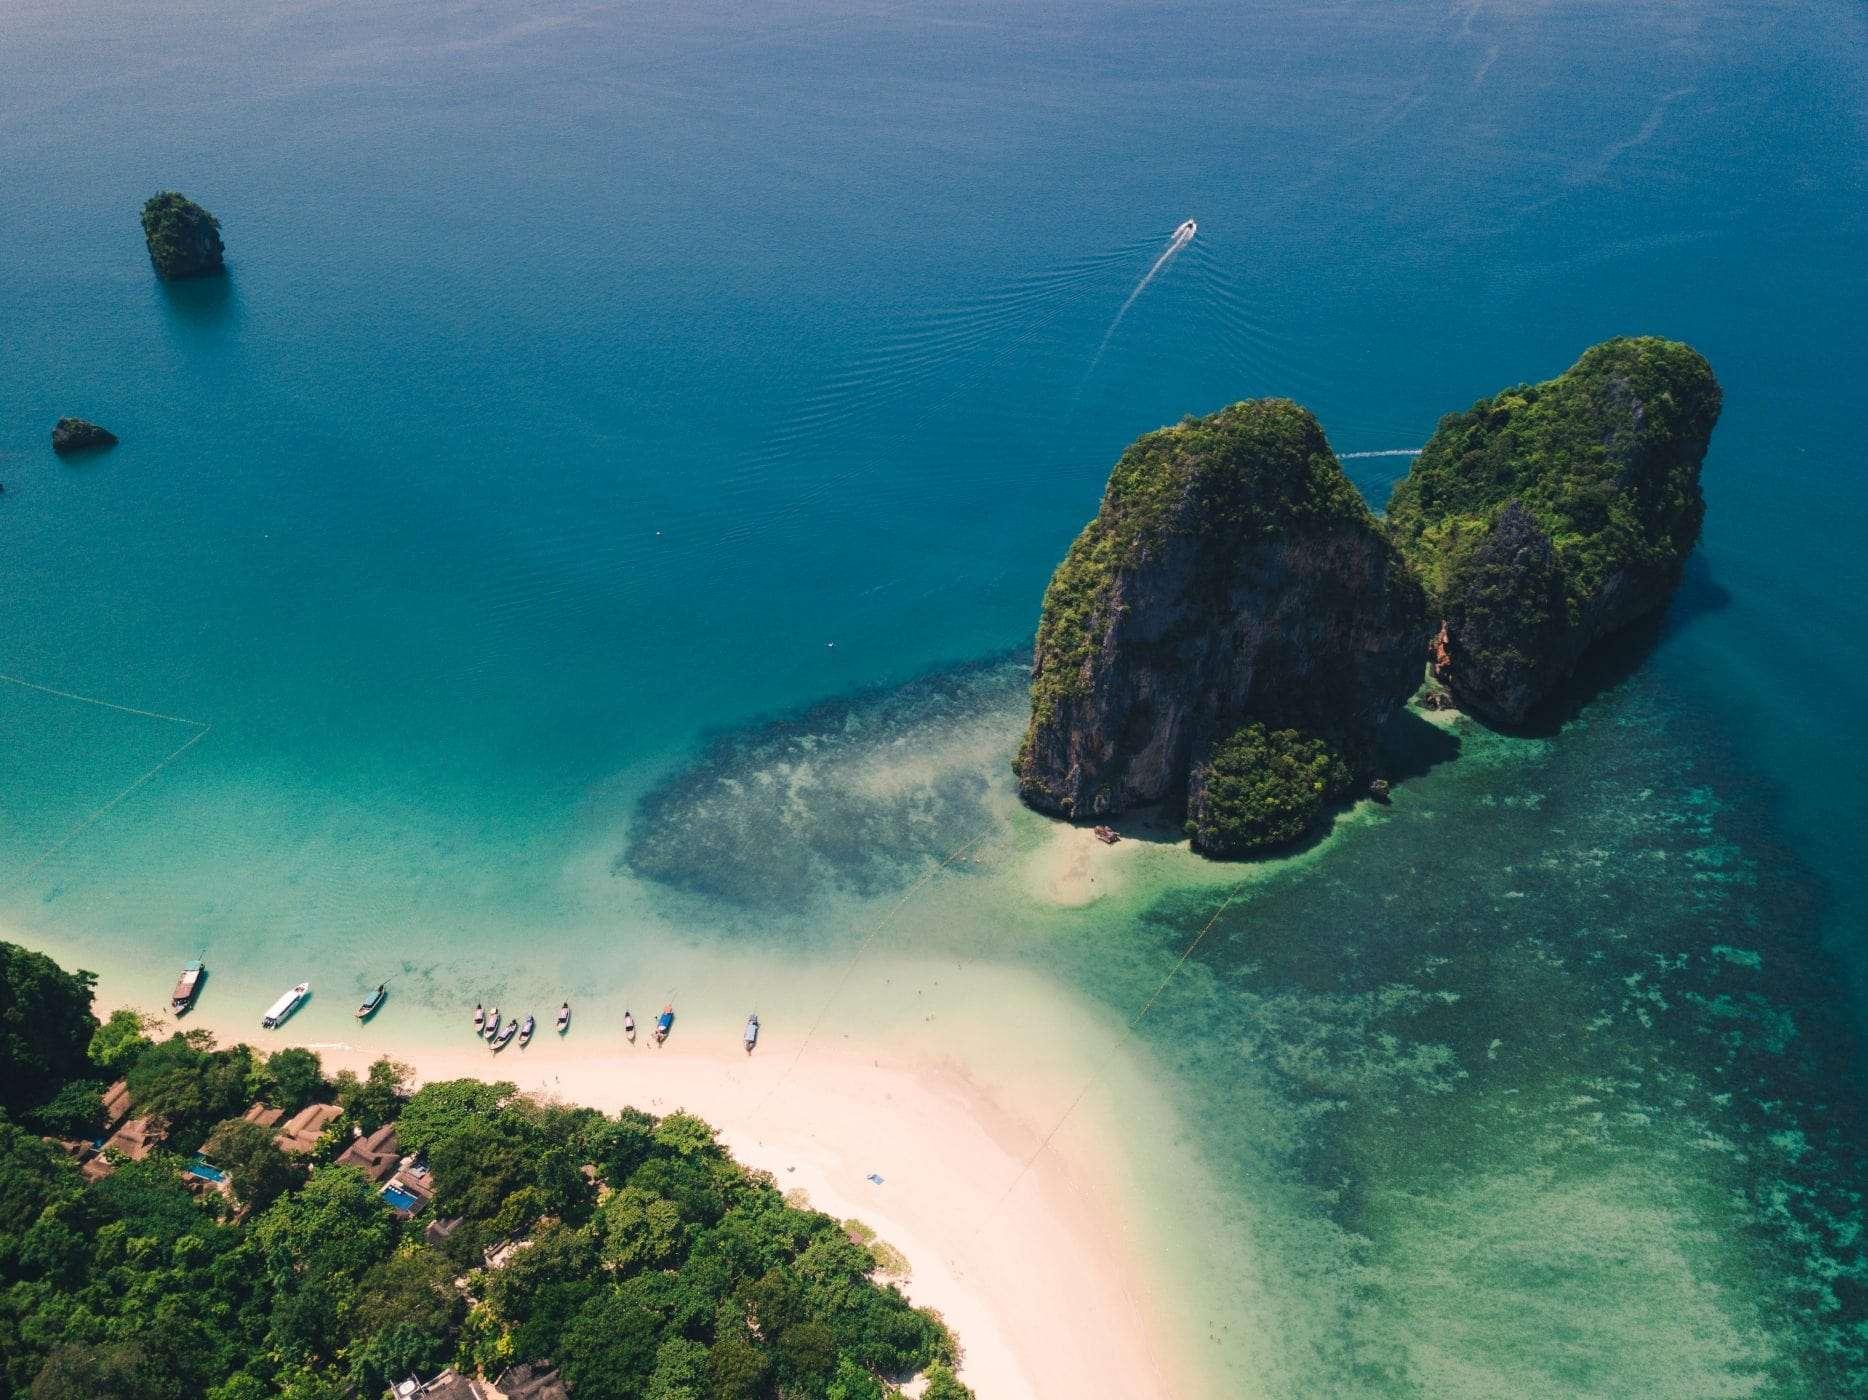 thailand-travel-guide-krabi-province